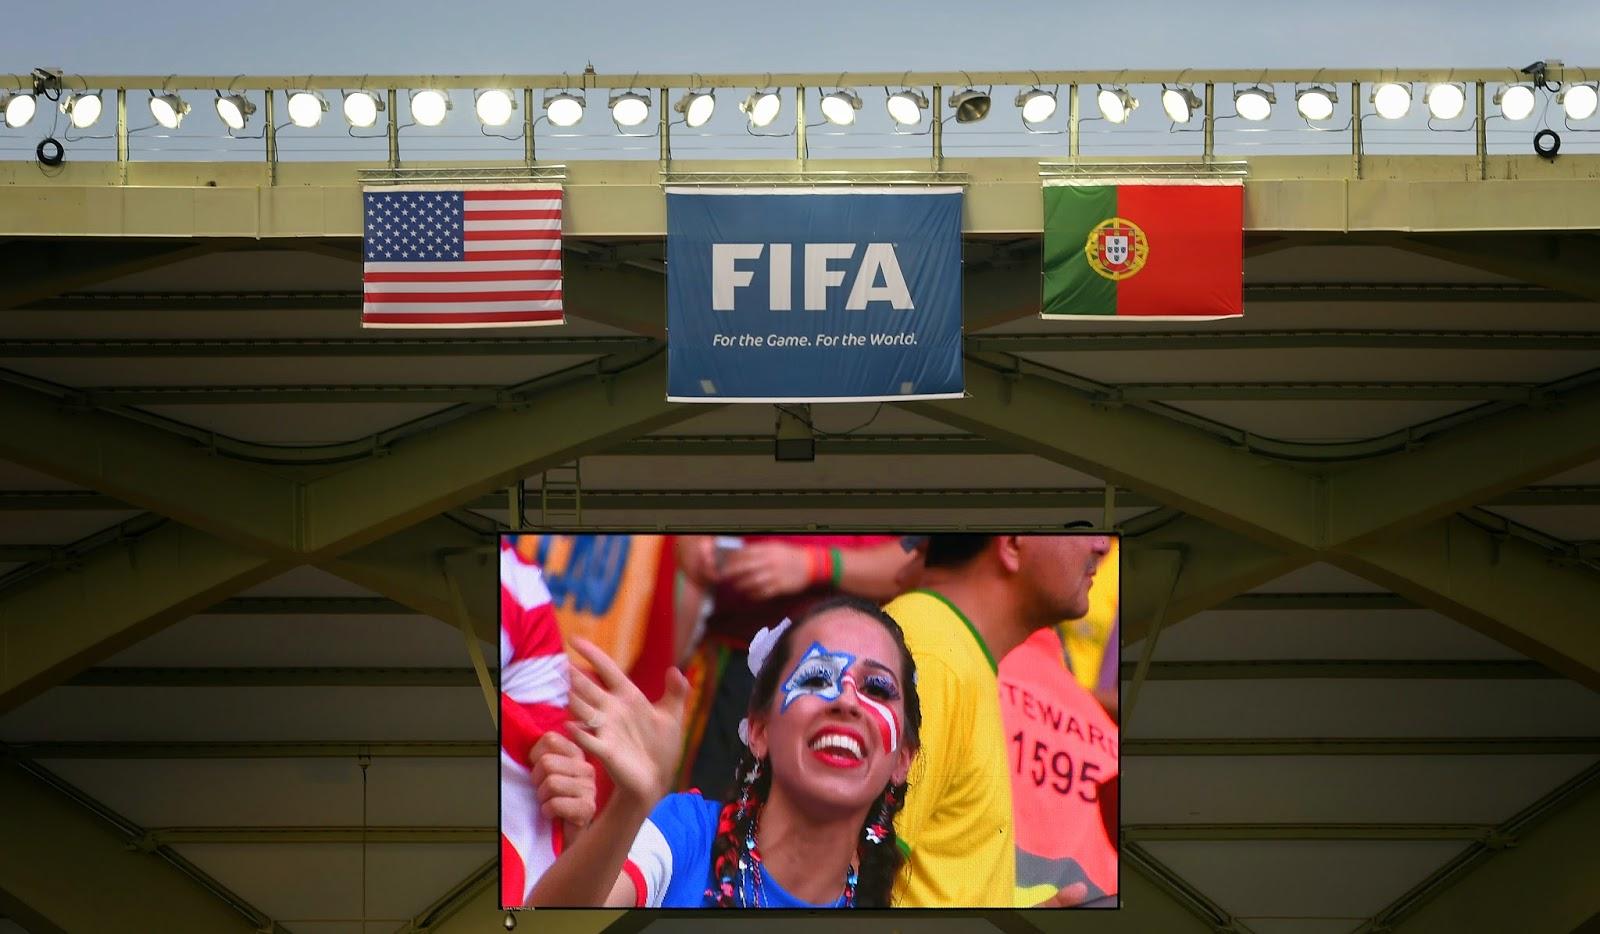 fifa flags